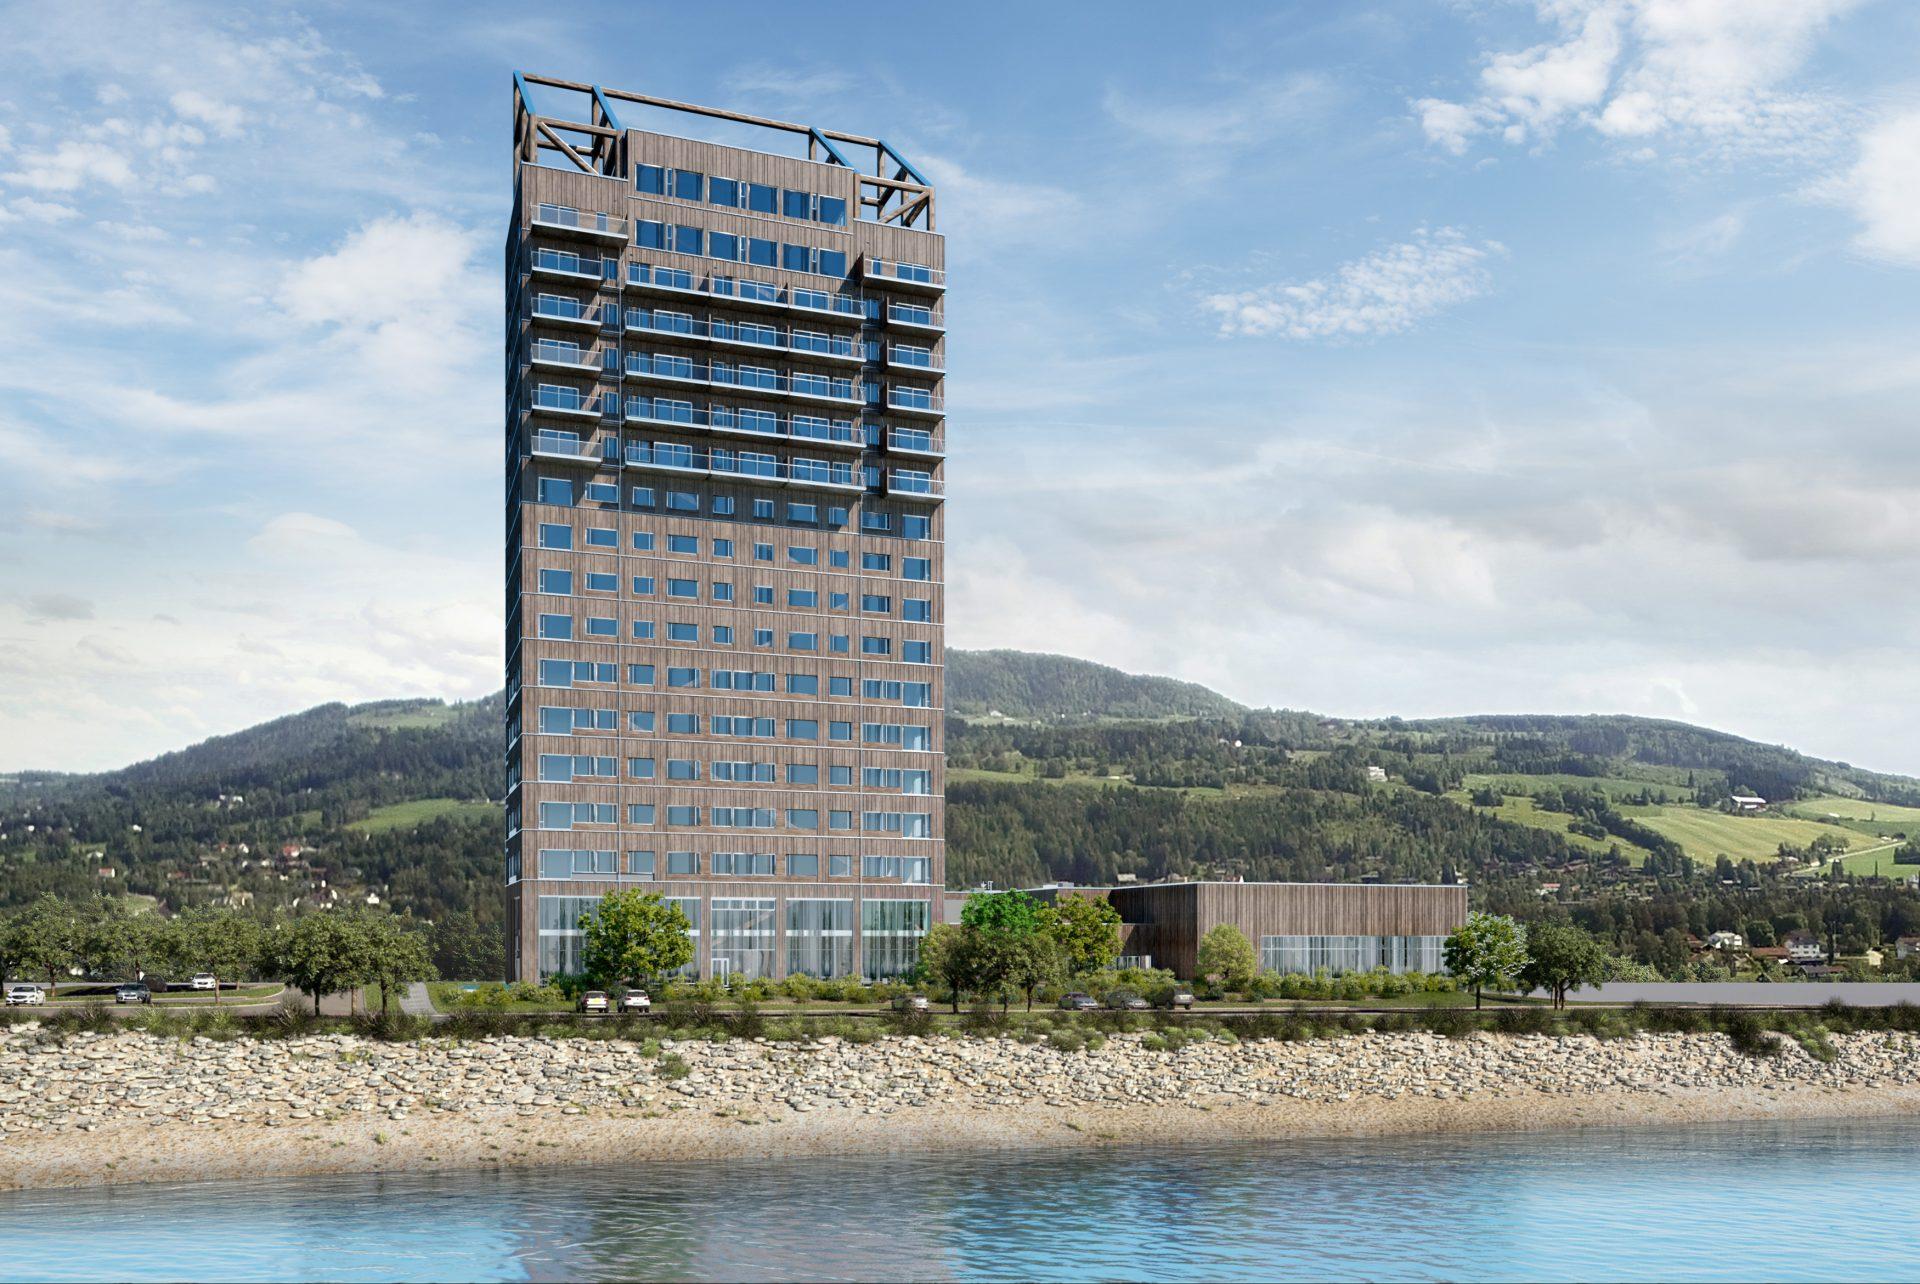 Mjøstårnet-tower-norsko-drevo-stavba-kancelarie-hotel